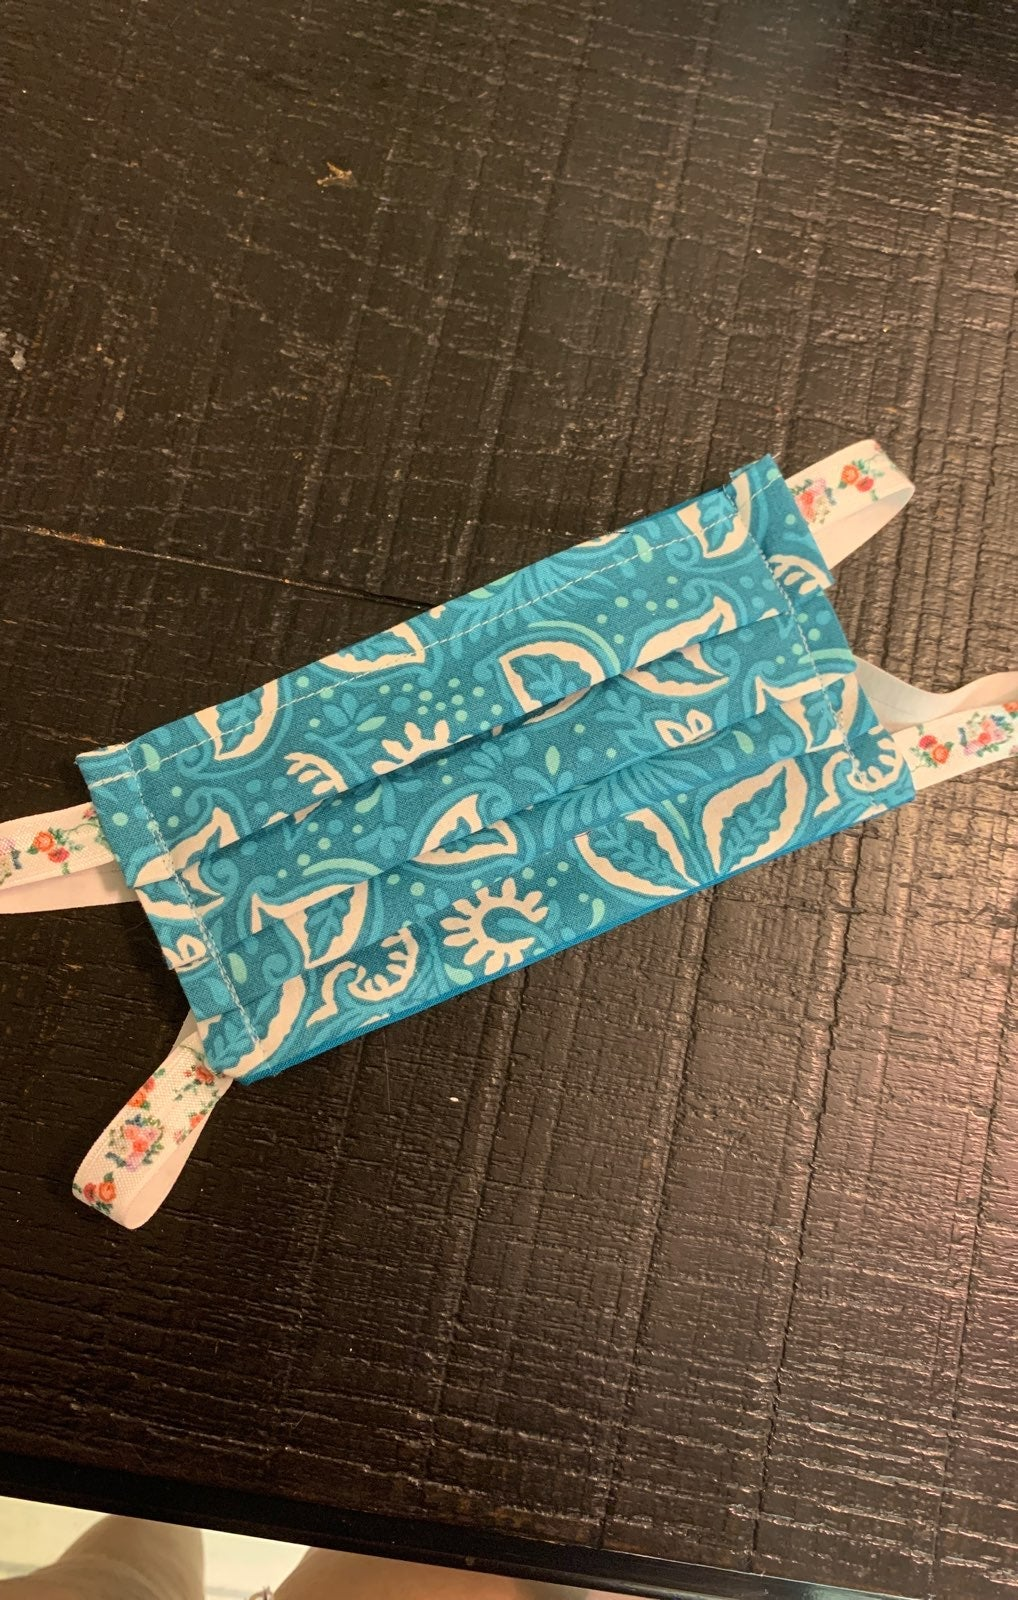 Homemade cloth facemask w/ filter pocket